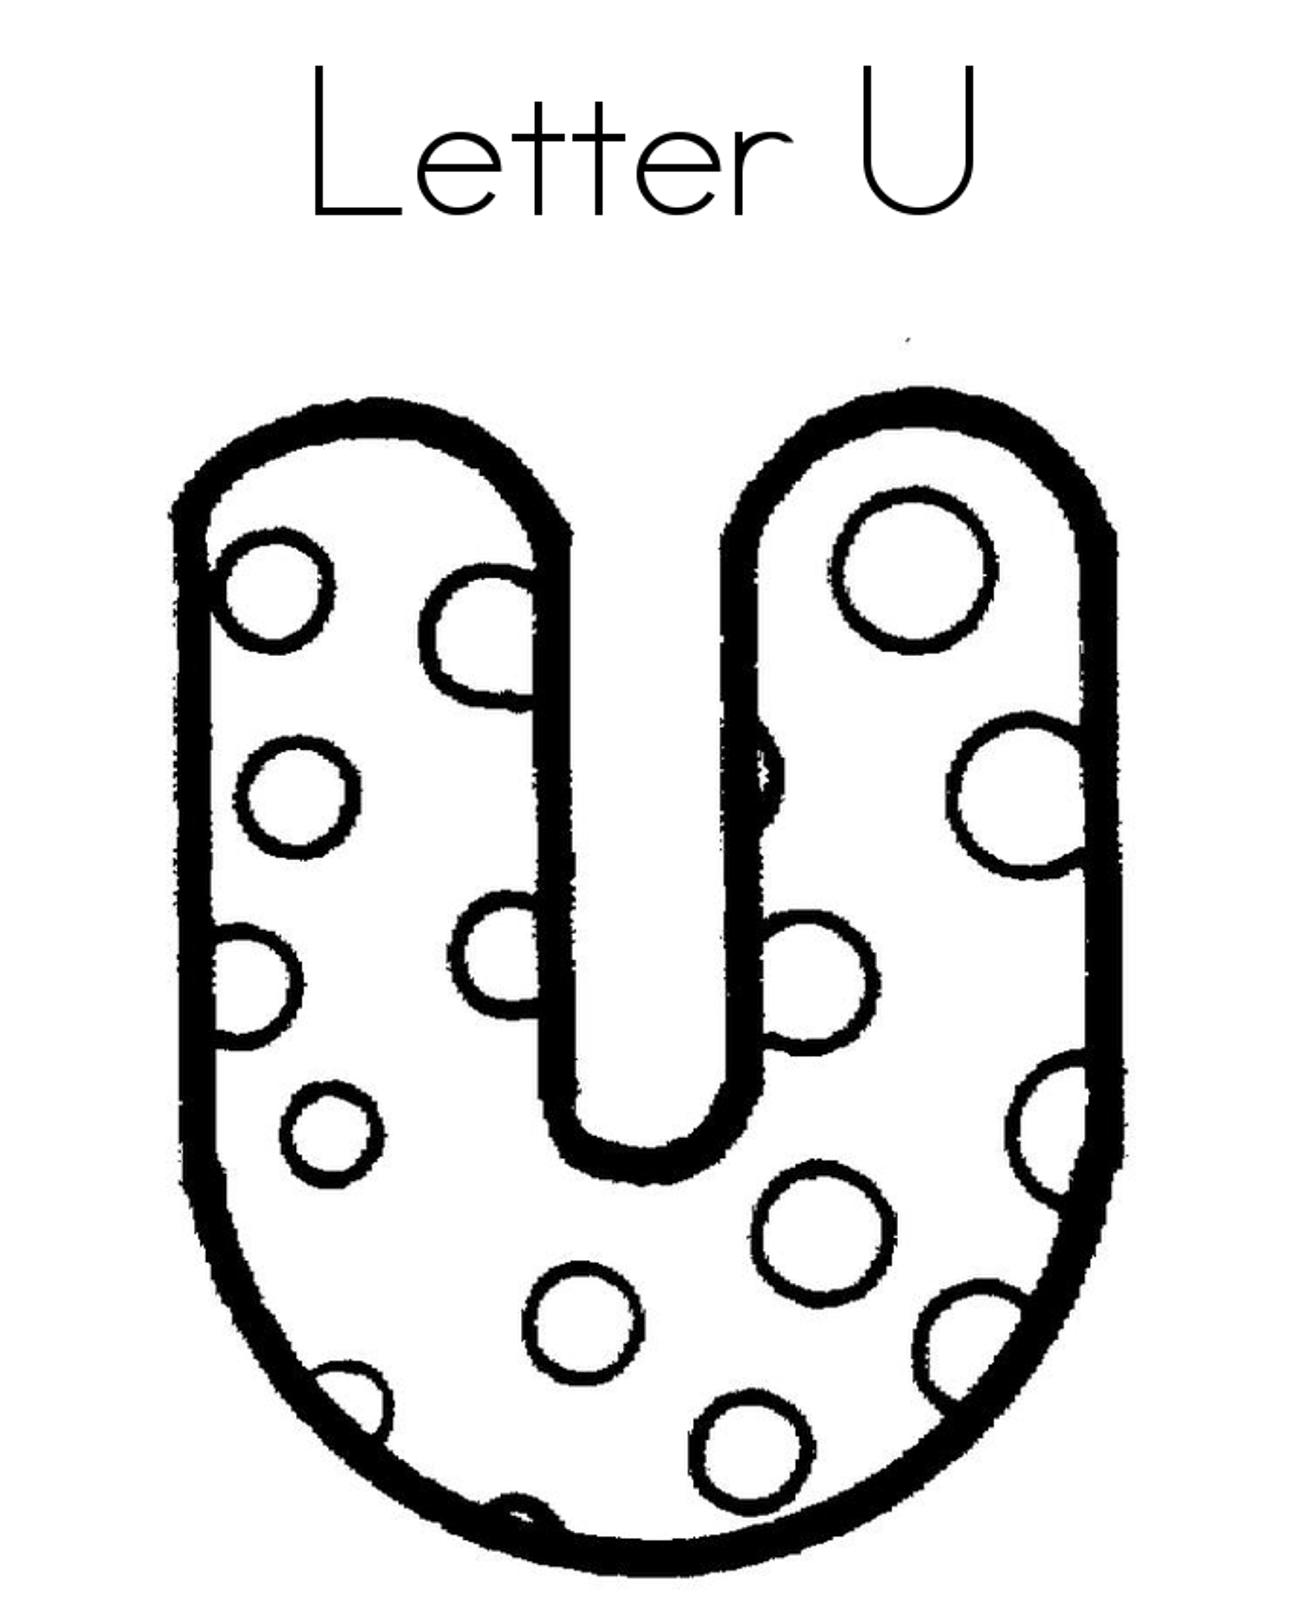 Letter u coloring pages preschool - Letter U Dots Alphabet Coloring Pages Free